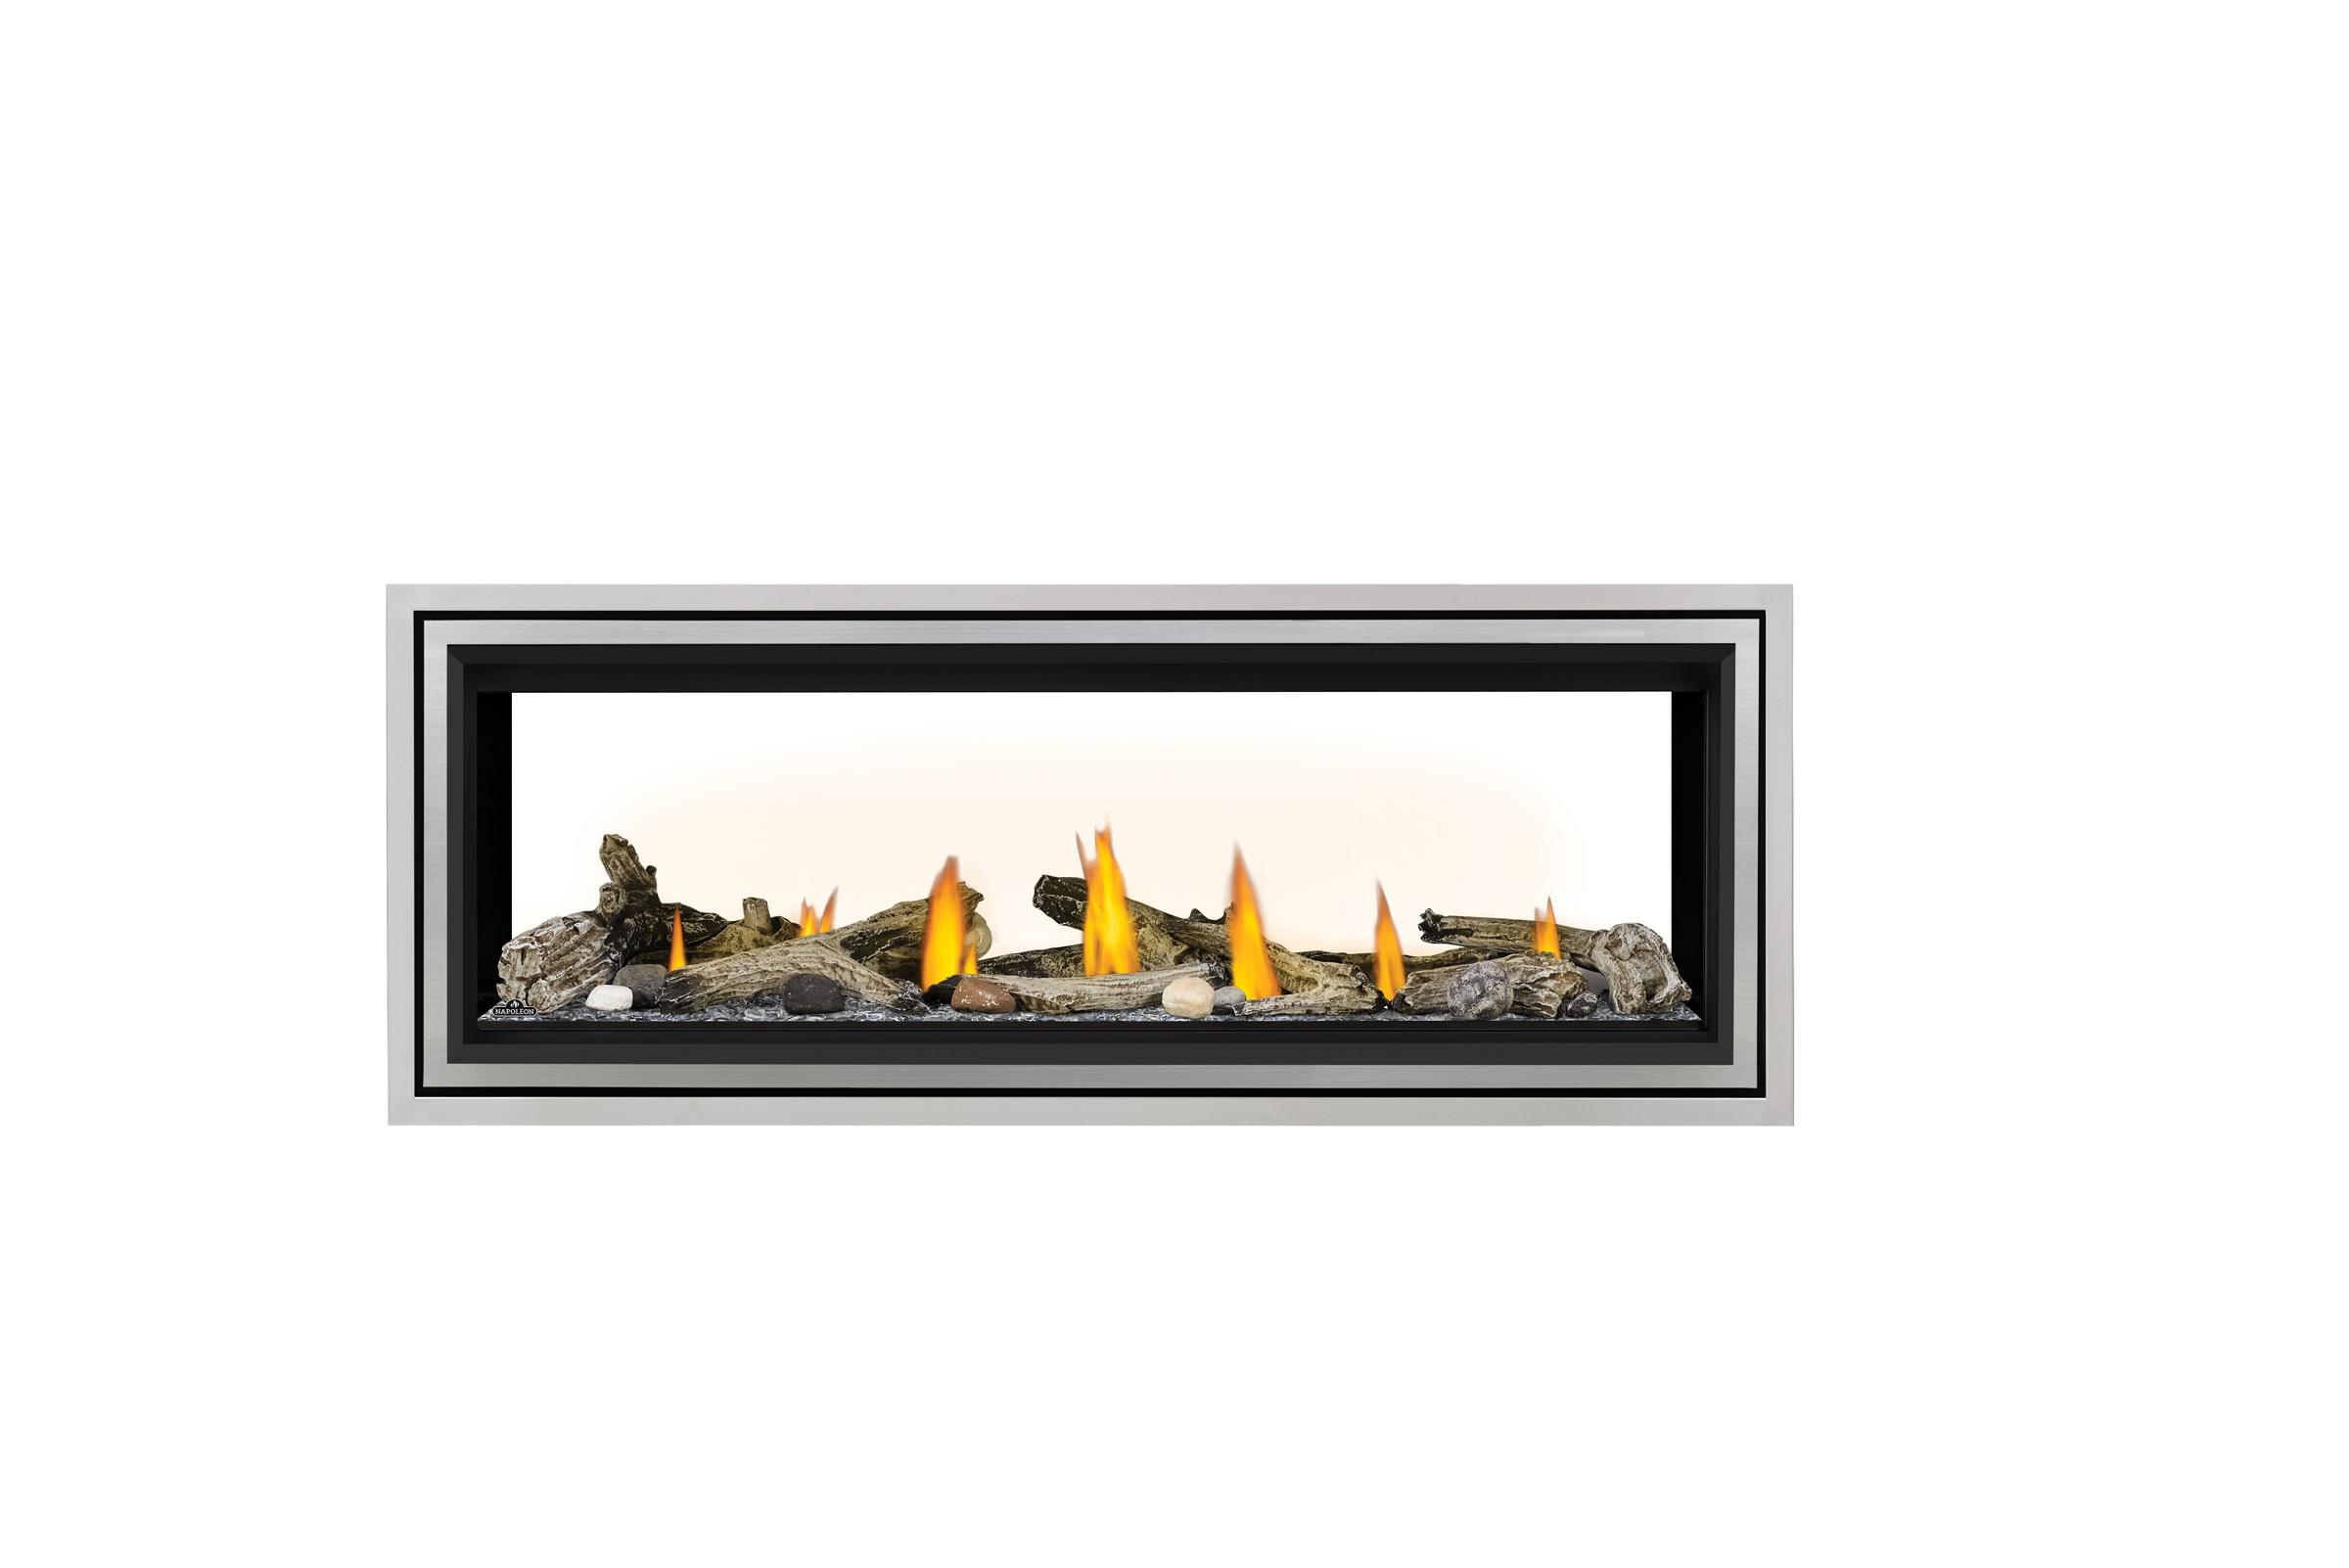 Napoleon Vector LV50 See Thru-Beach-Fire-Glass-Beads-SS-Trim-Premium-Safety-Barrier